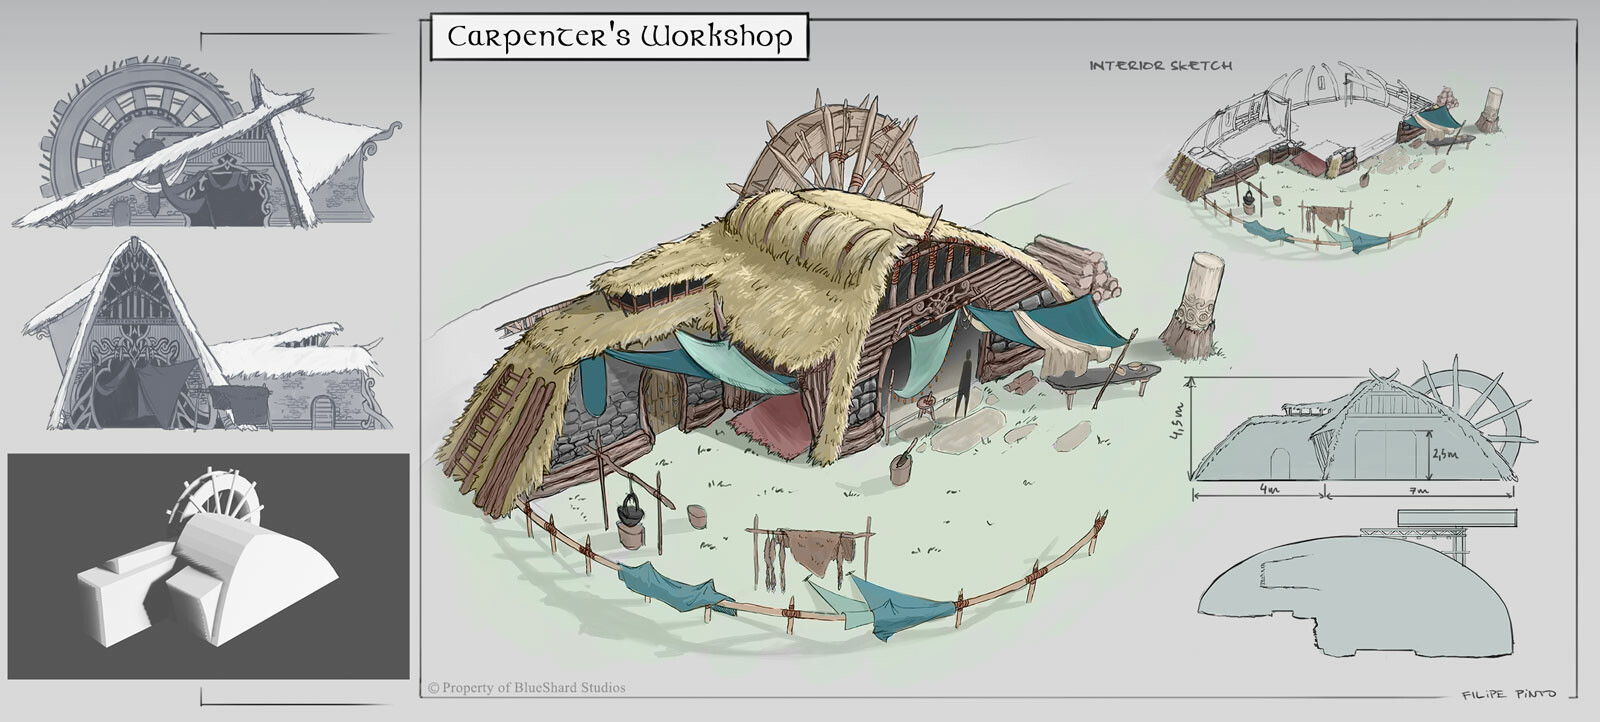 Filipe pinto carpenter portfolio